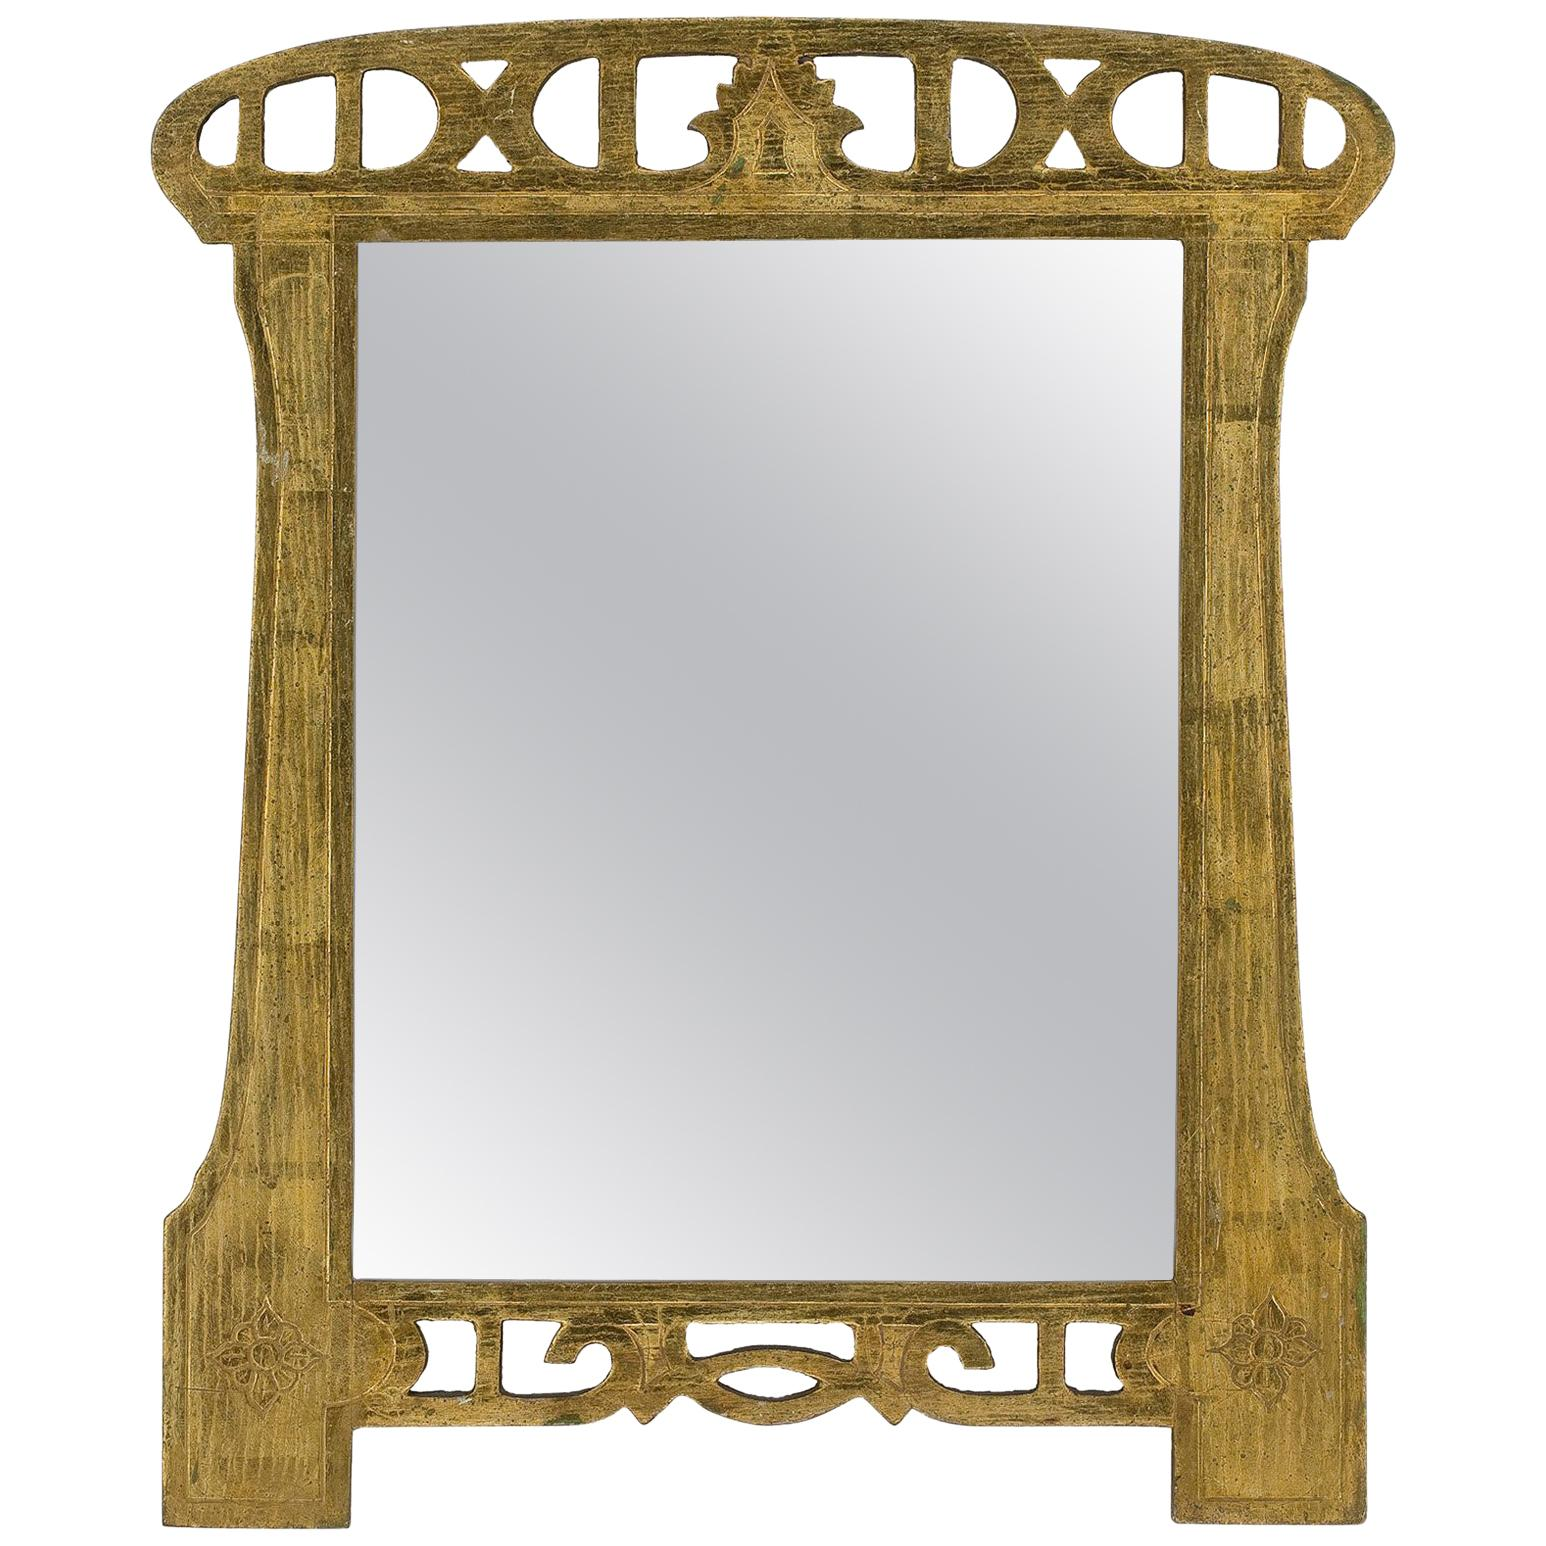 Early 20th Century Art Nouveau Mirror